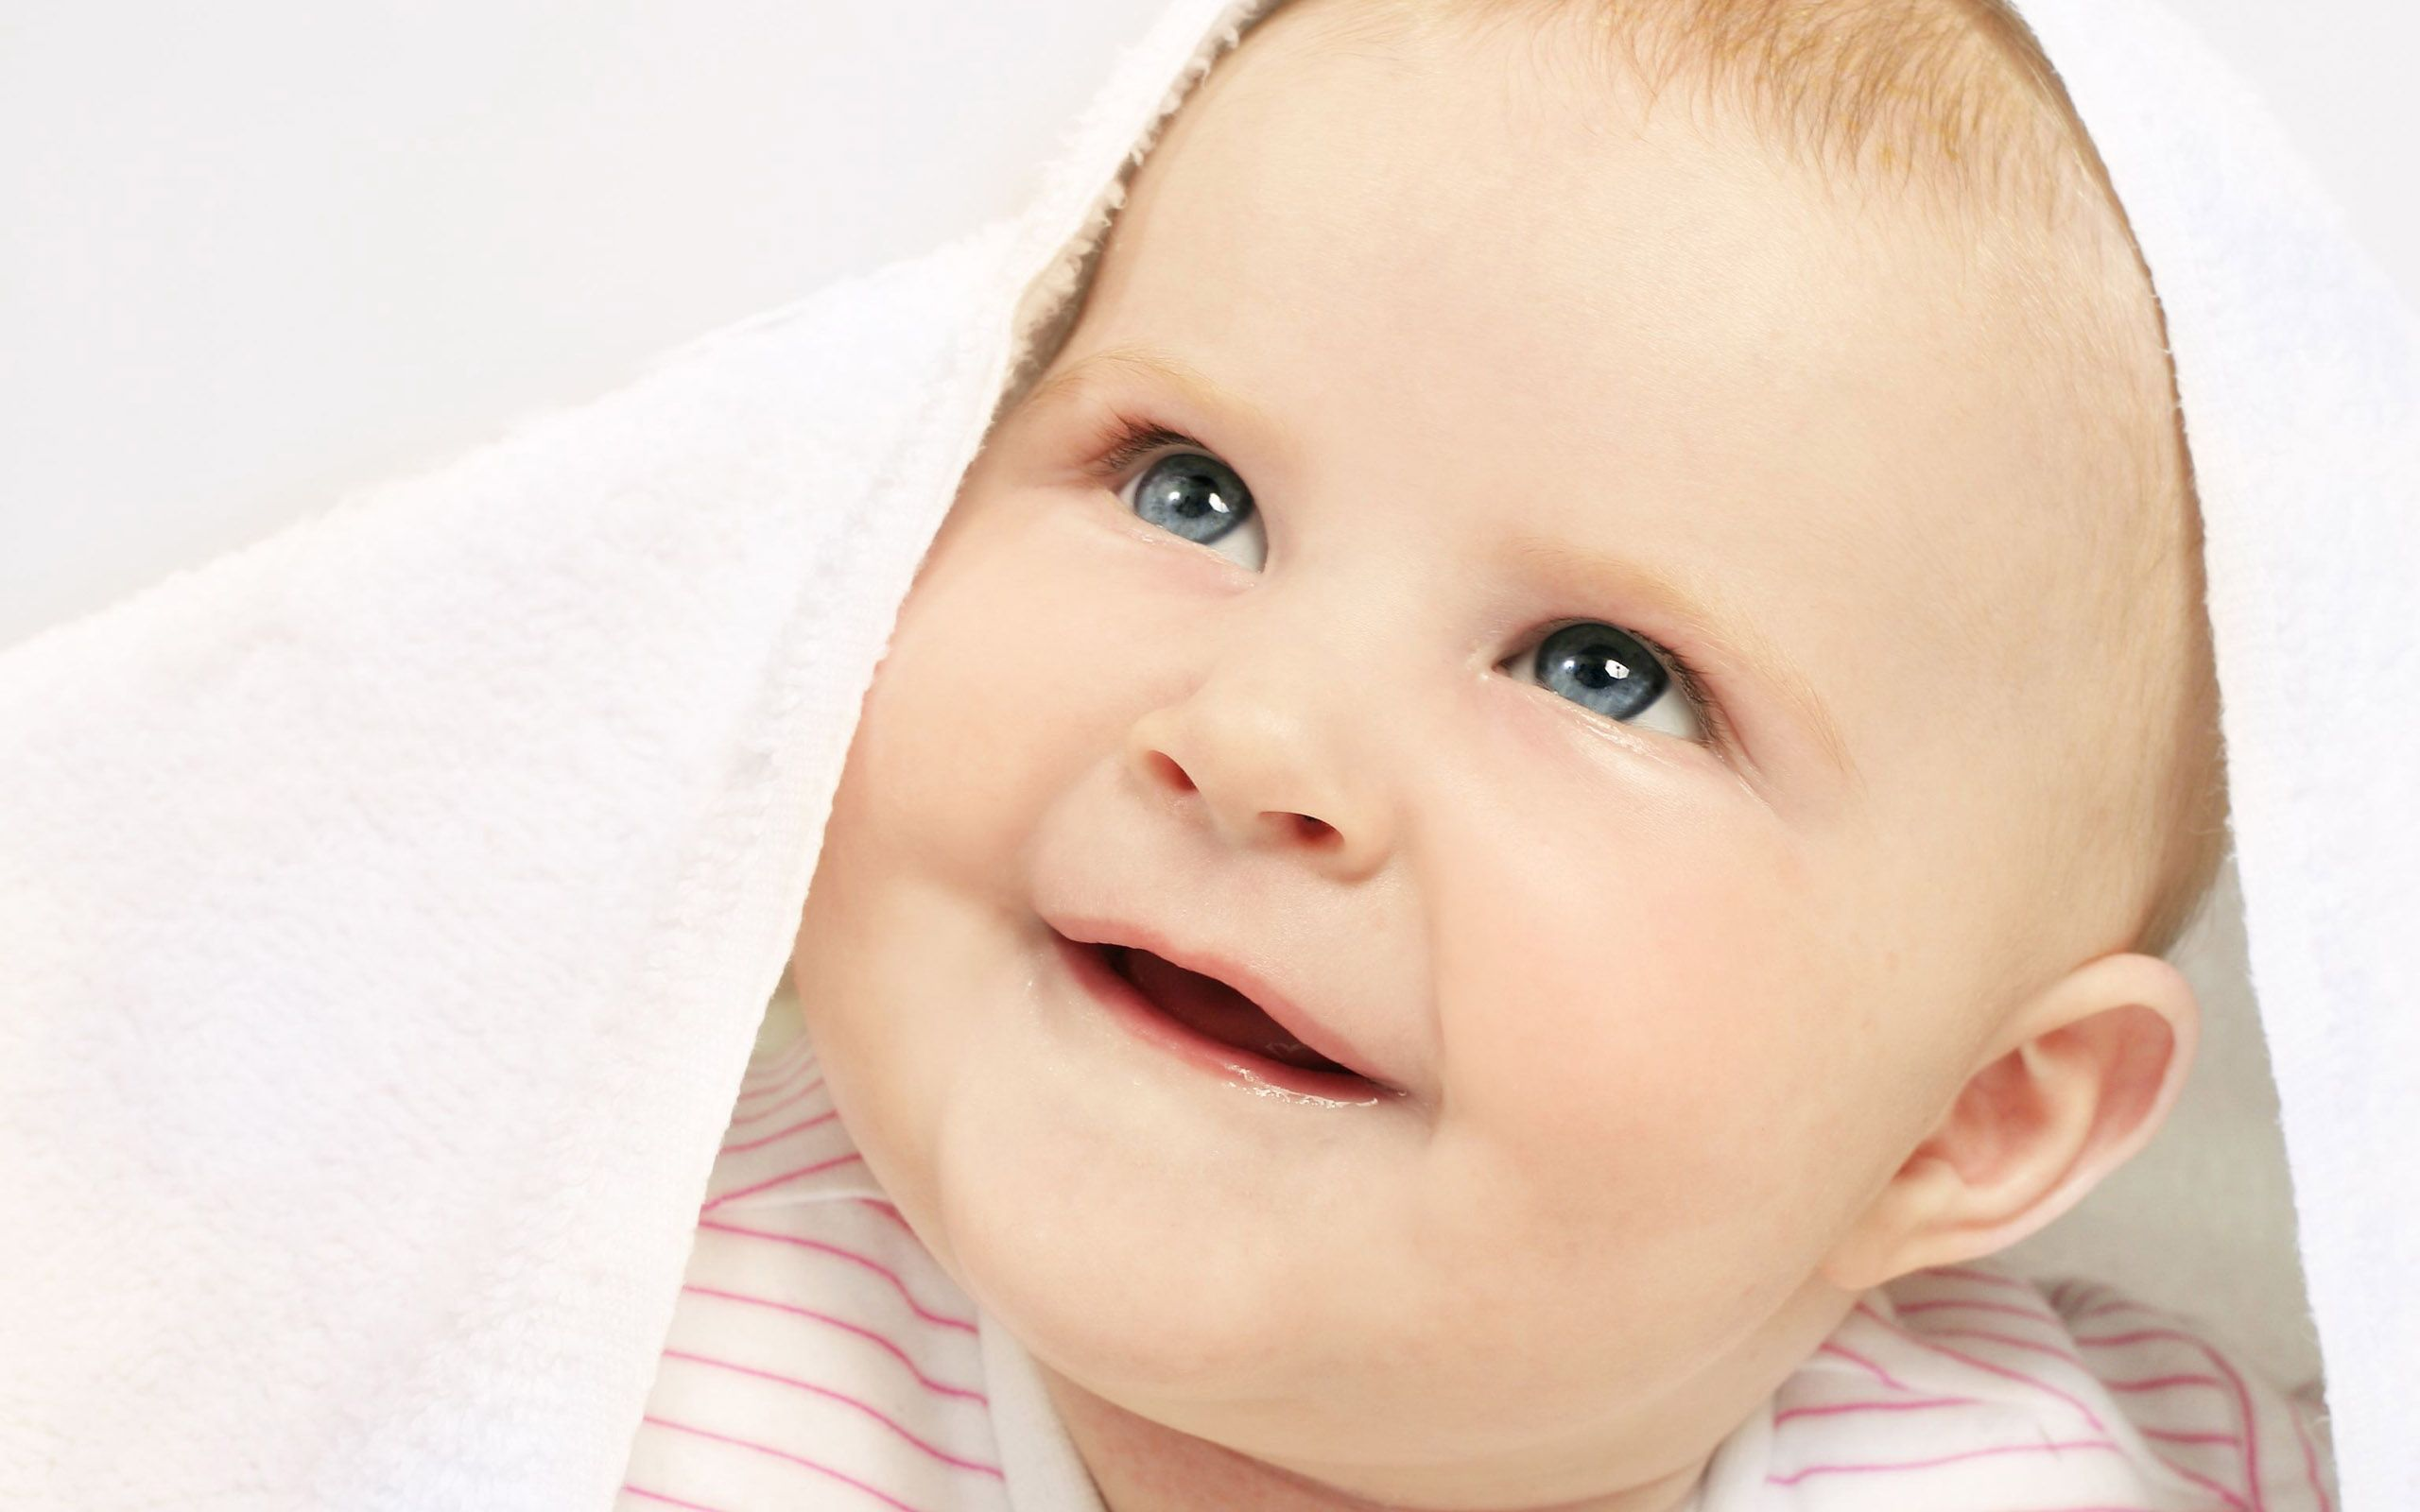 Babydesktopwallpapers Free Download Baby Desktop Wallpapers Customize Your Desktop With Baby Cute Baby Wallpaper Cute Baby Boy Images Cute Baby Boy Pictures